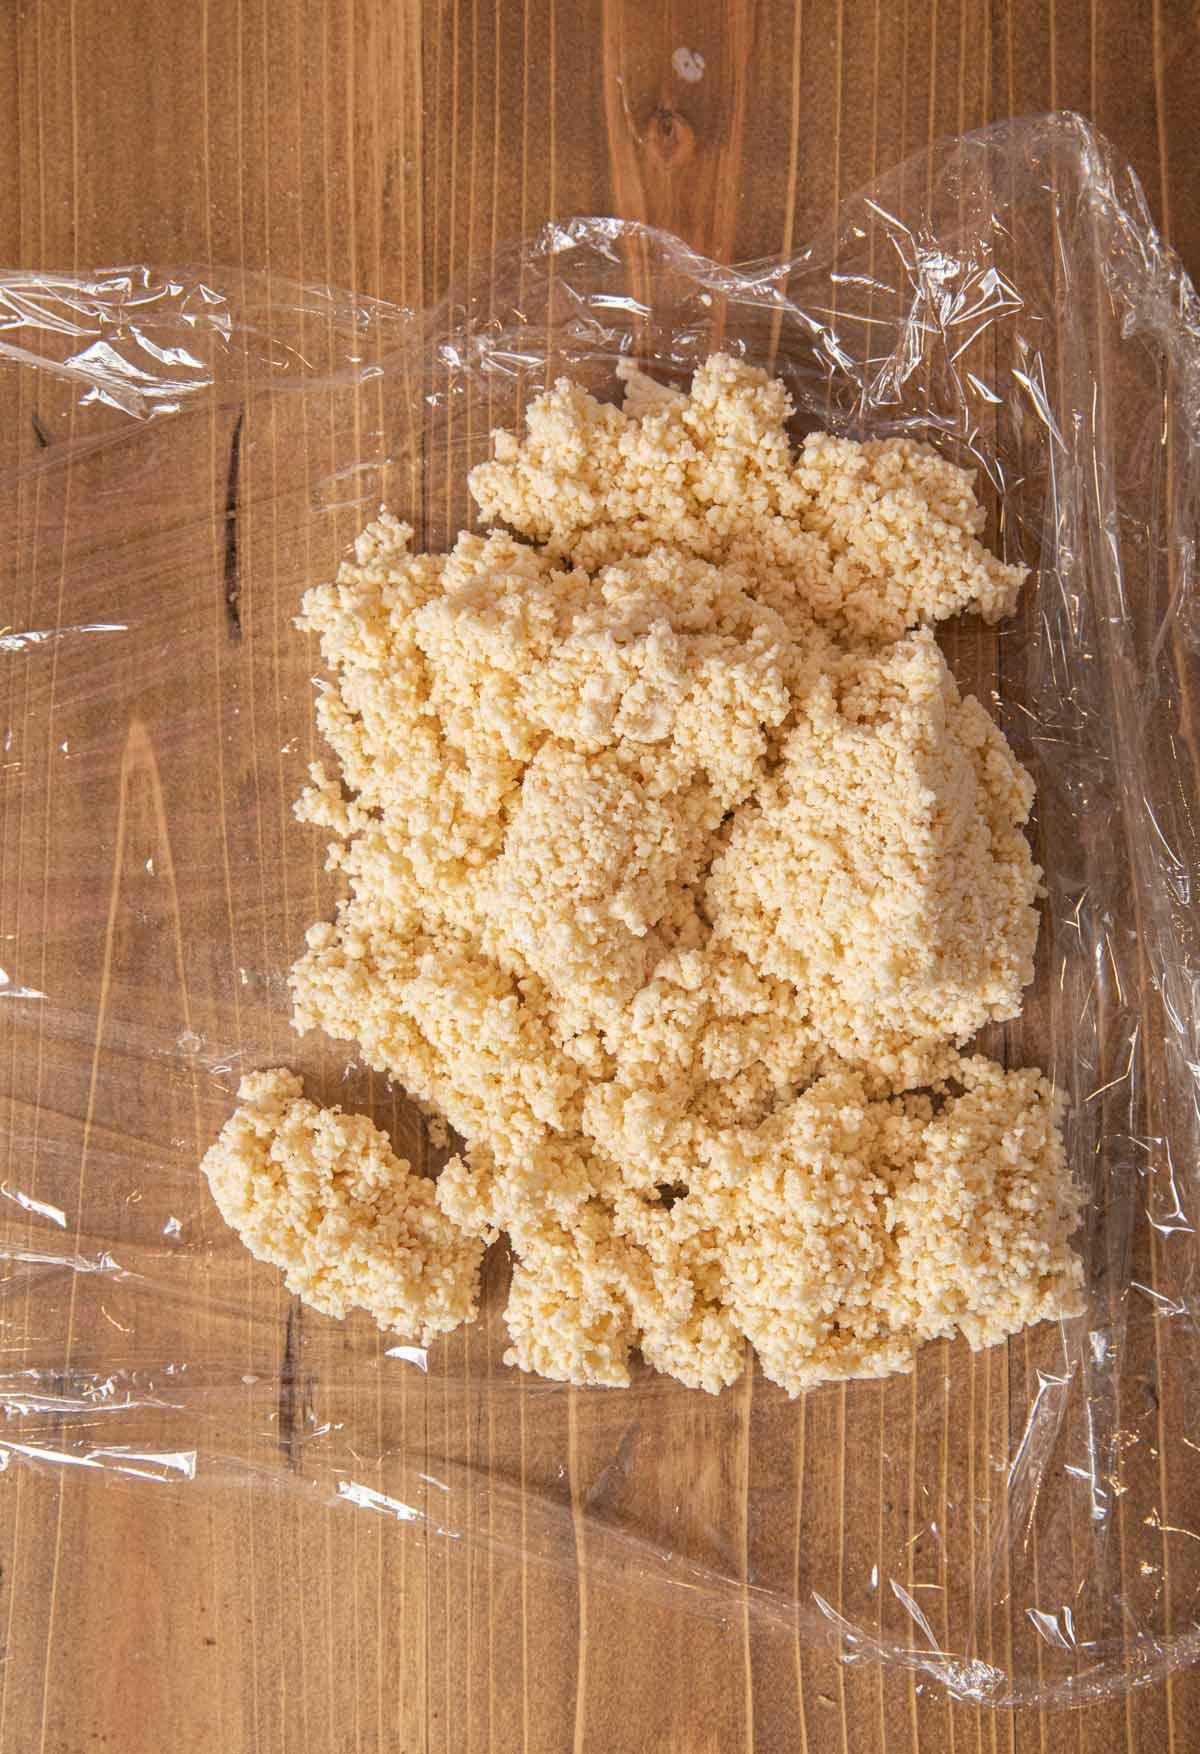 Pie Crust dough on saran wrap